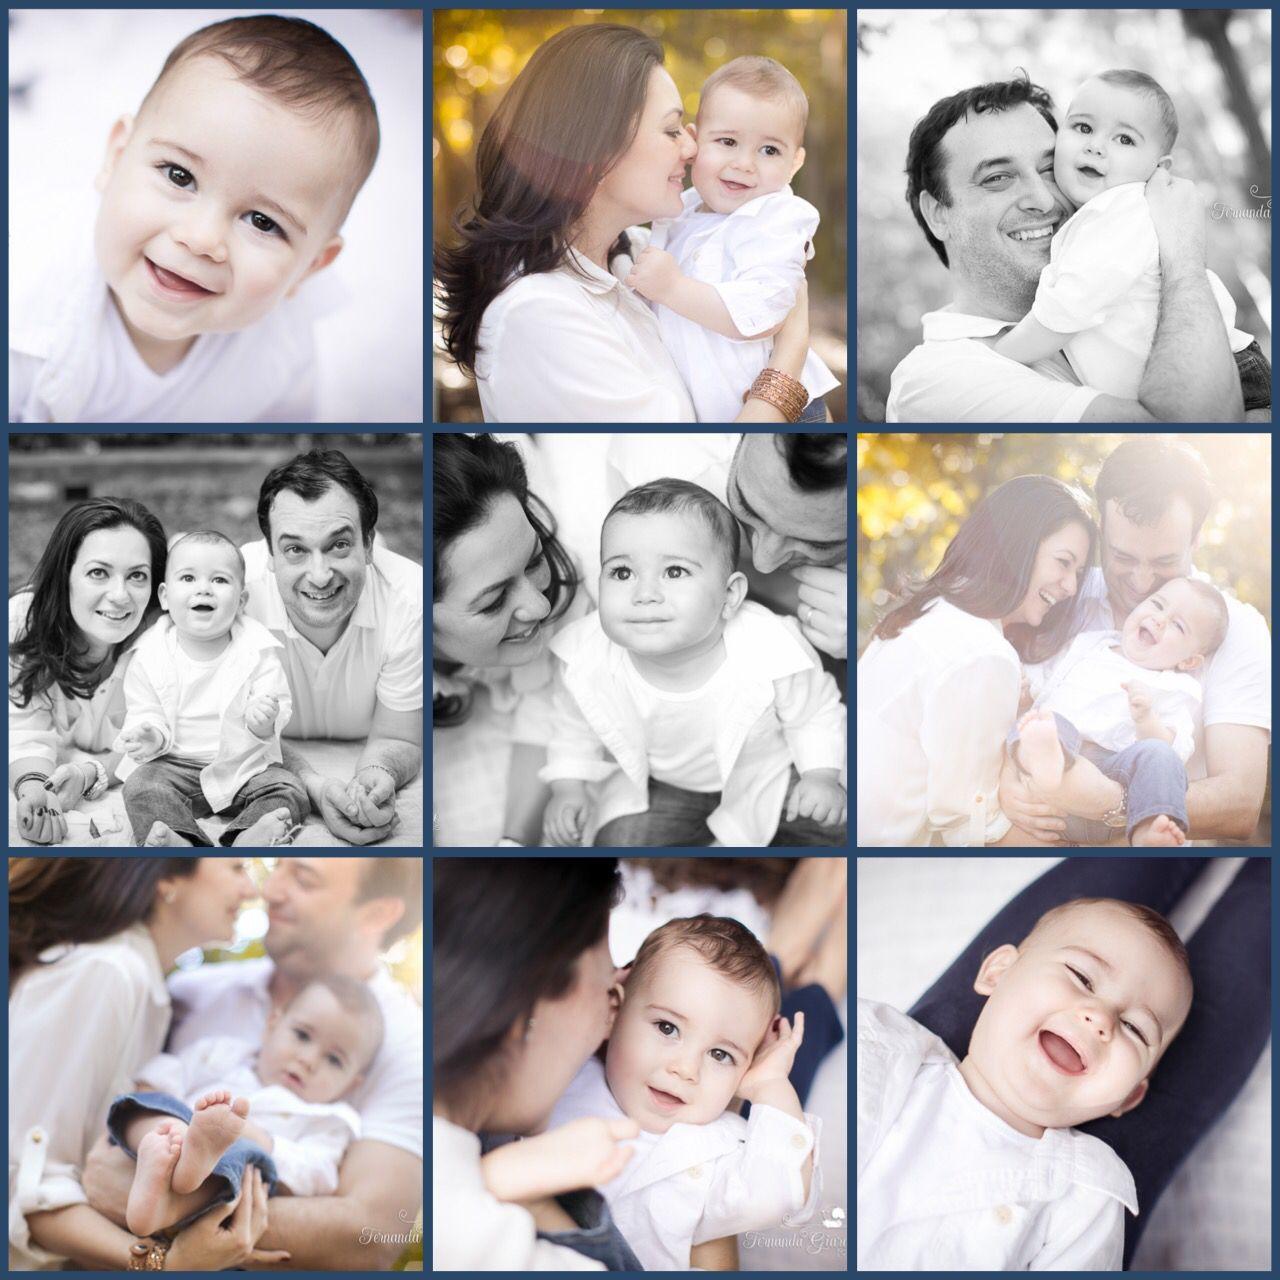 ensaios de familia, foto session, fotos de bebê, photograph, photo, photographer, fotografia, fotos de família, fotografia de bebê, fotografia de família, baby pic, baby photography, baby photo, baby, baby photos, cuties, cutes baby, family photograpy